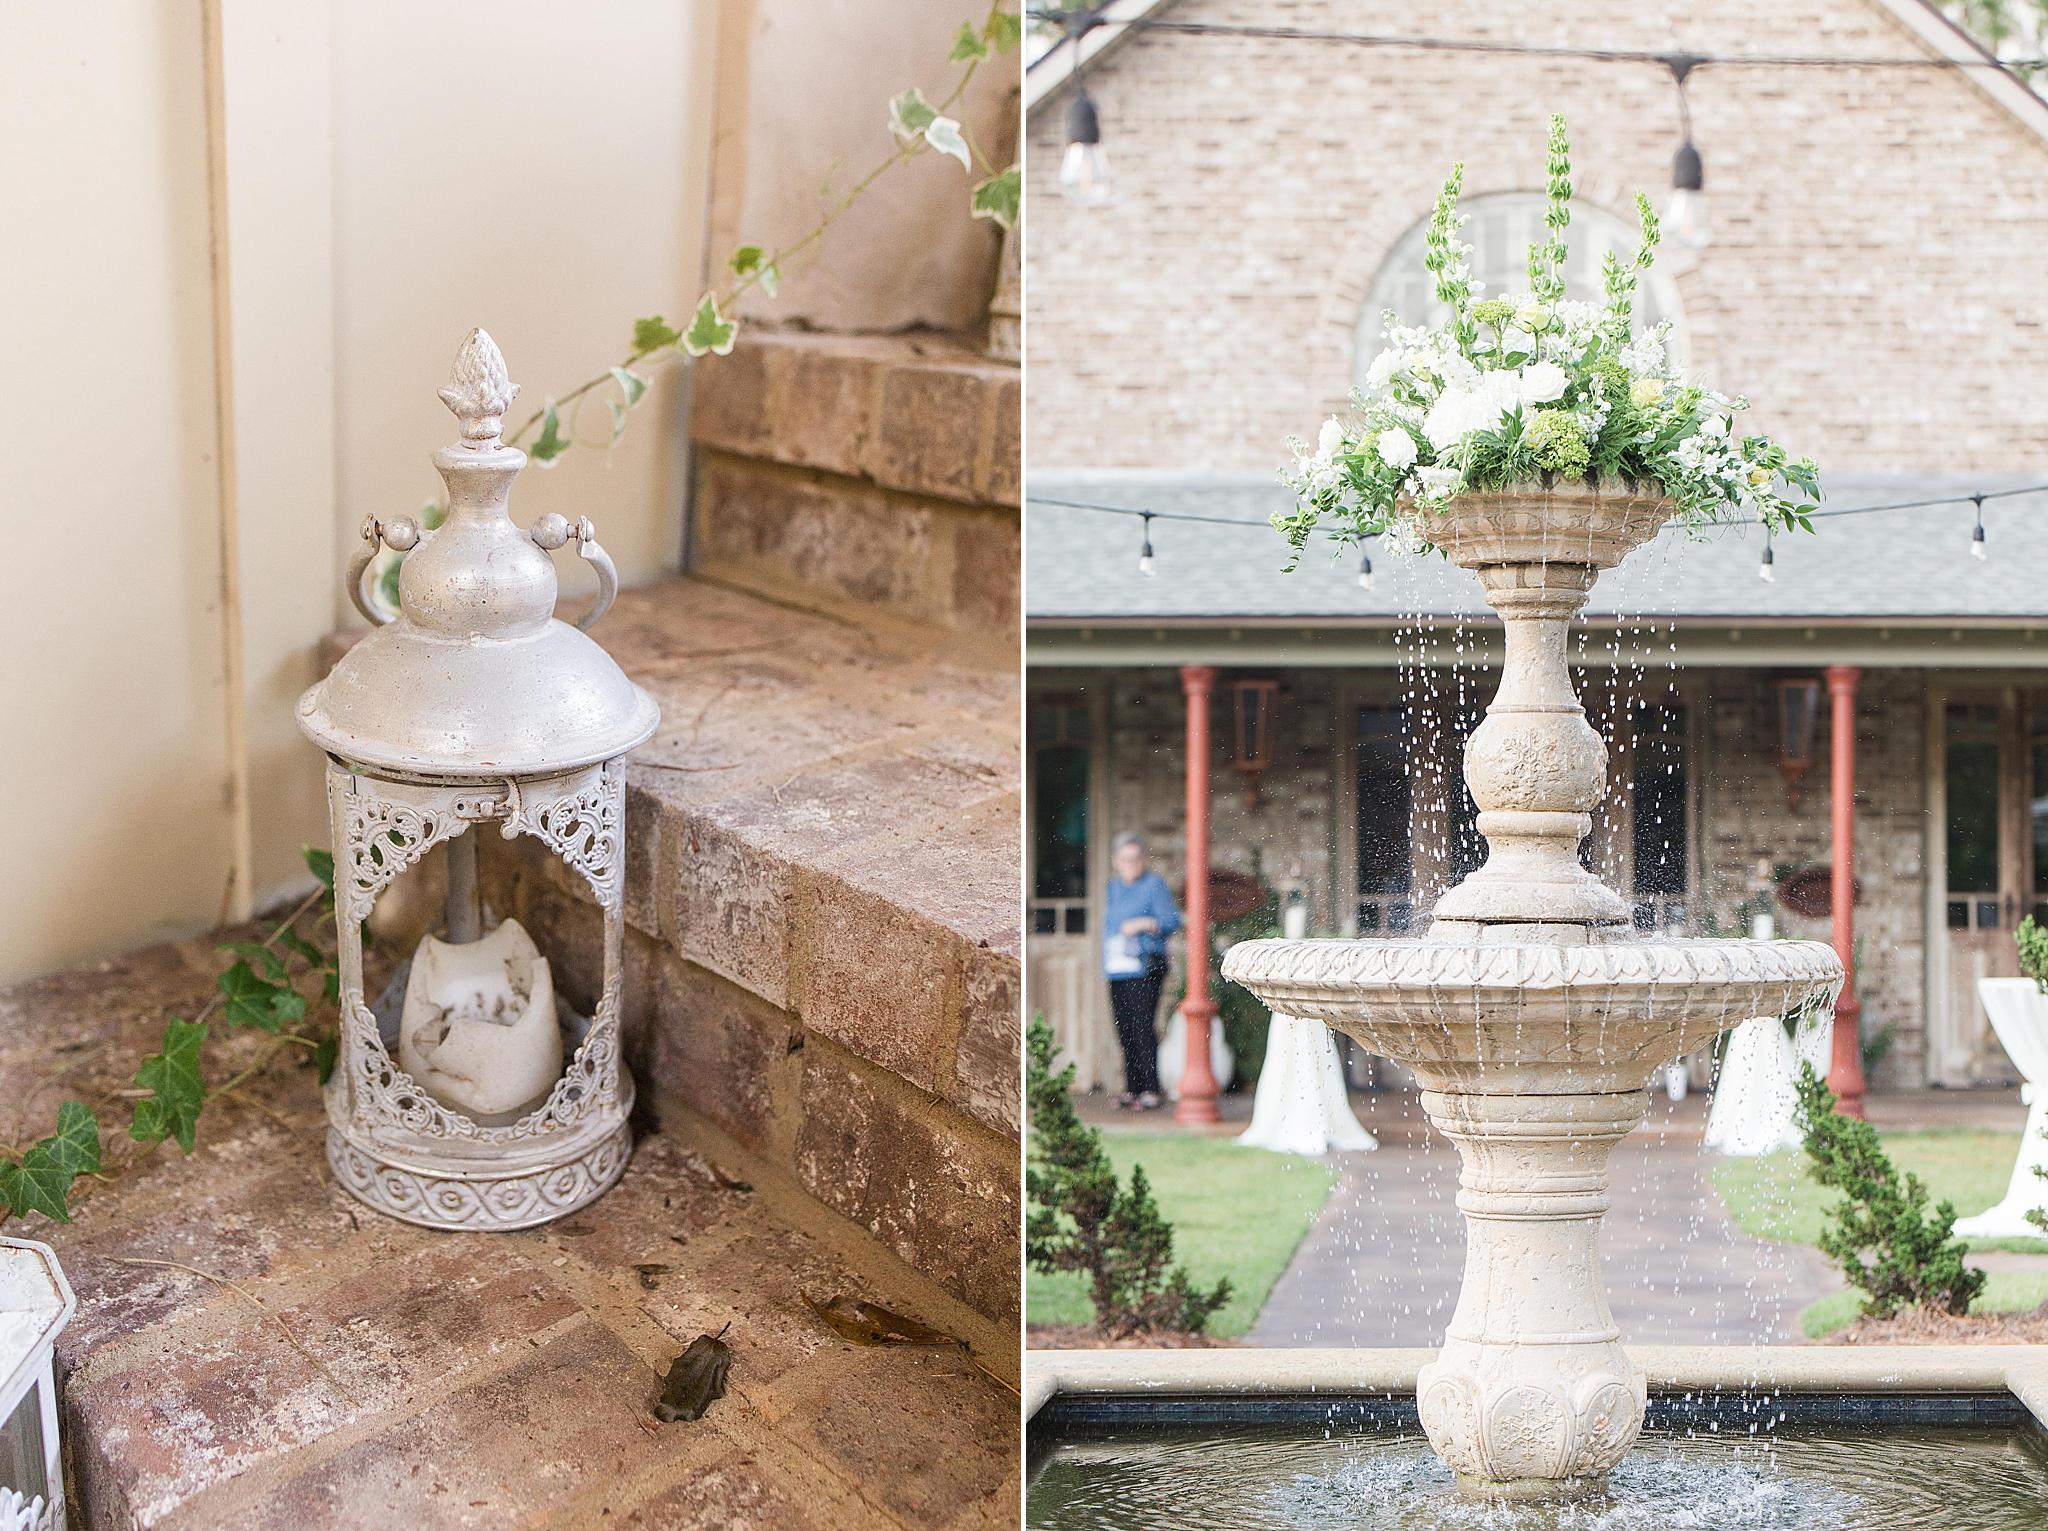 courtyard for wedding reception in Loxley AL